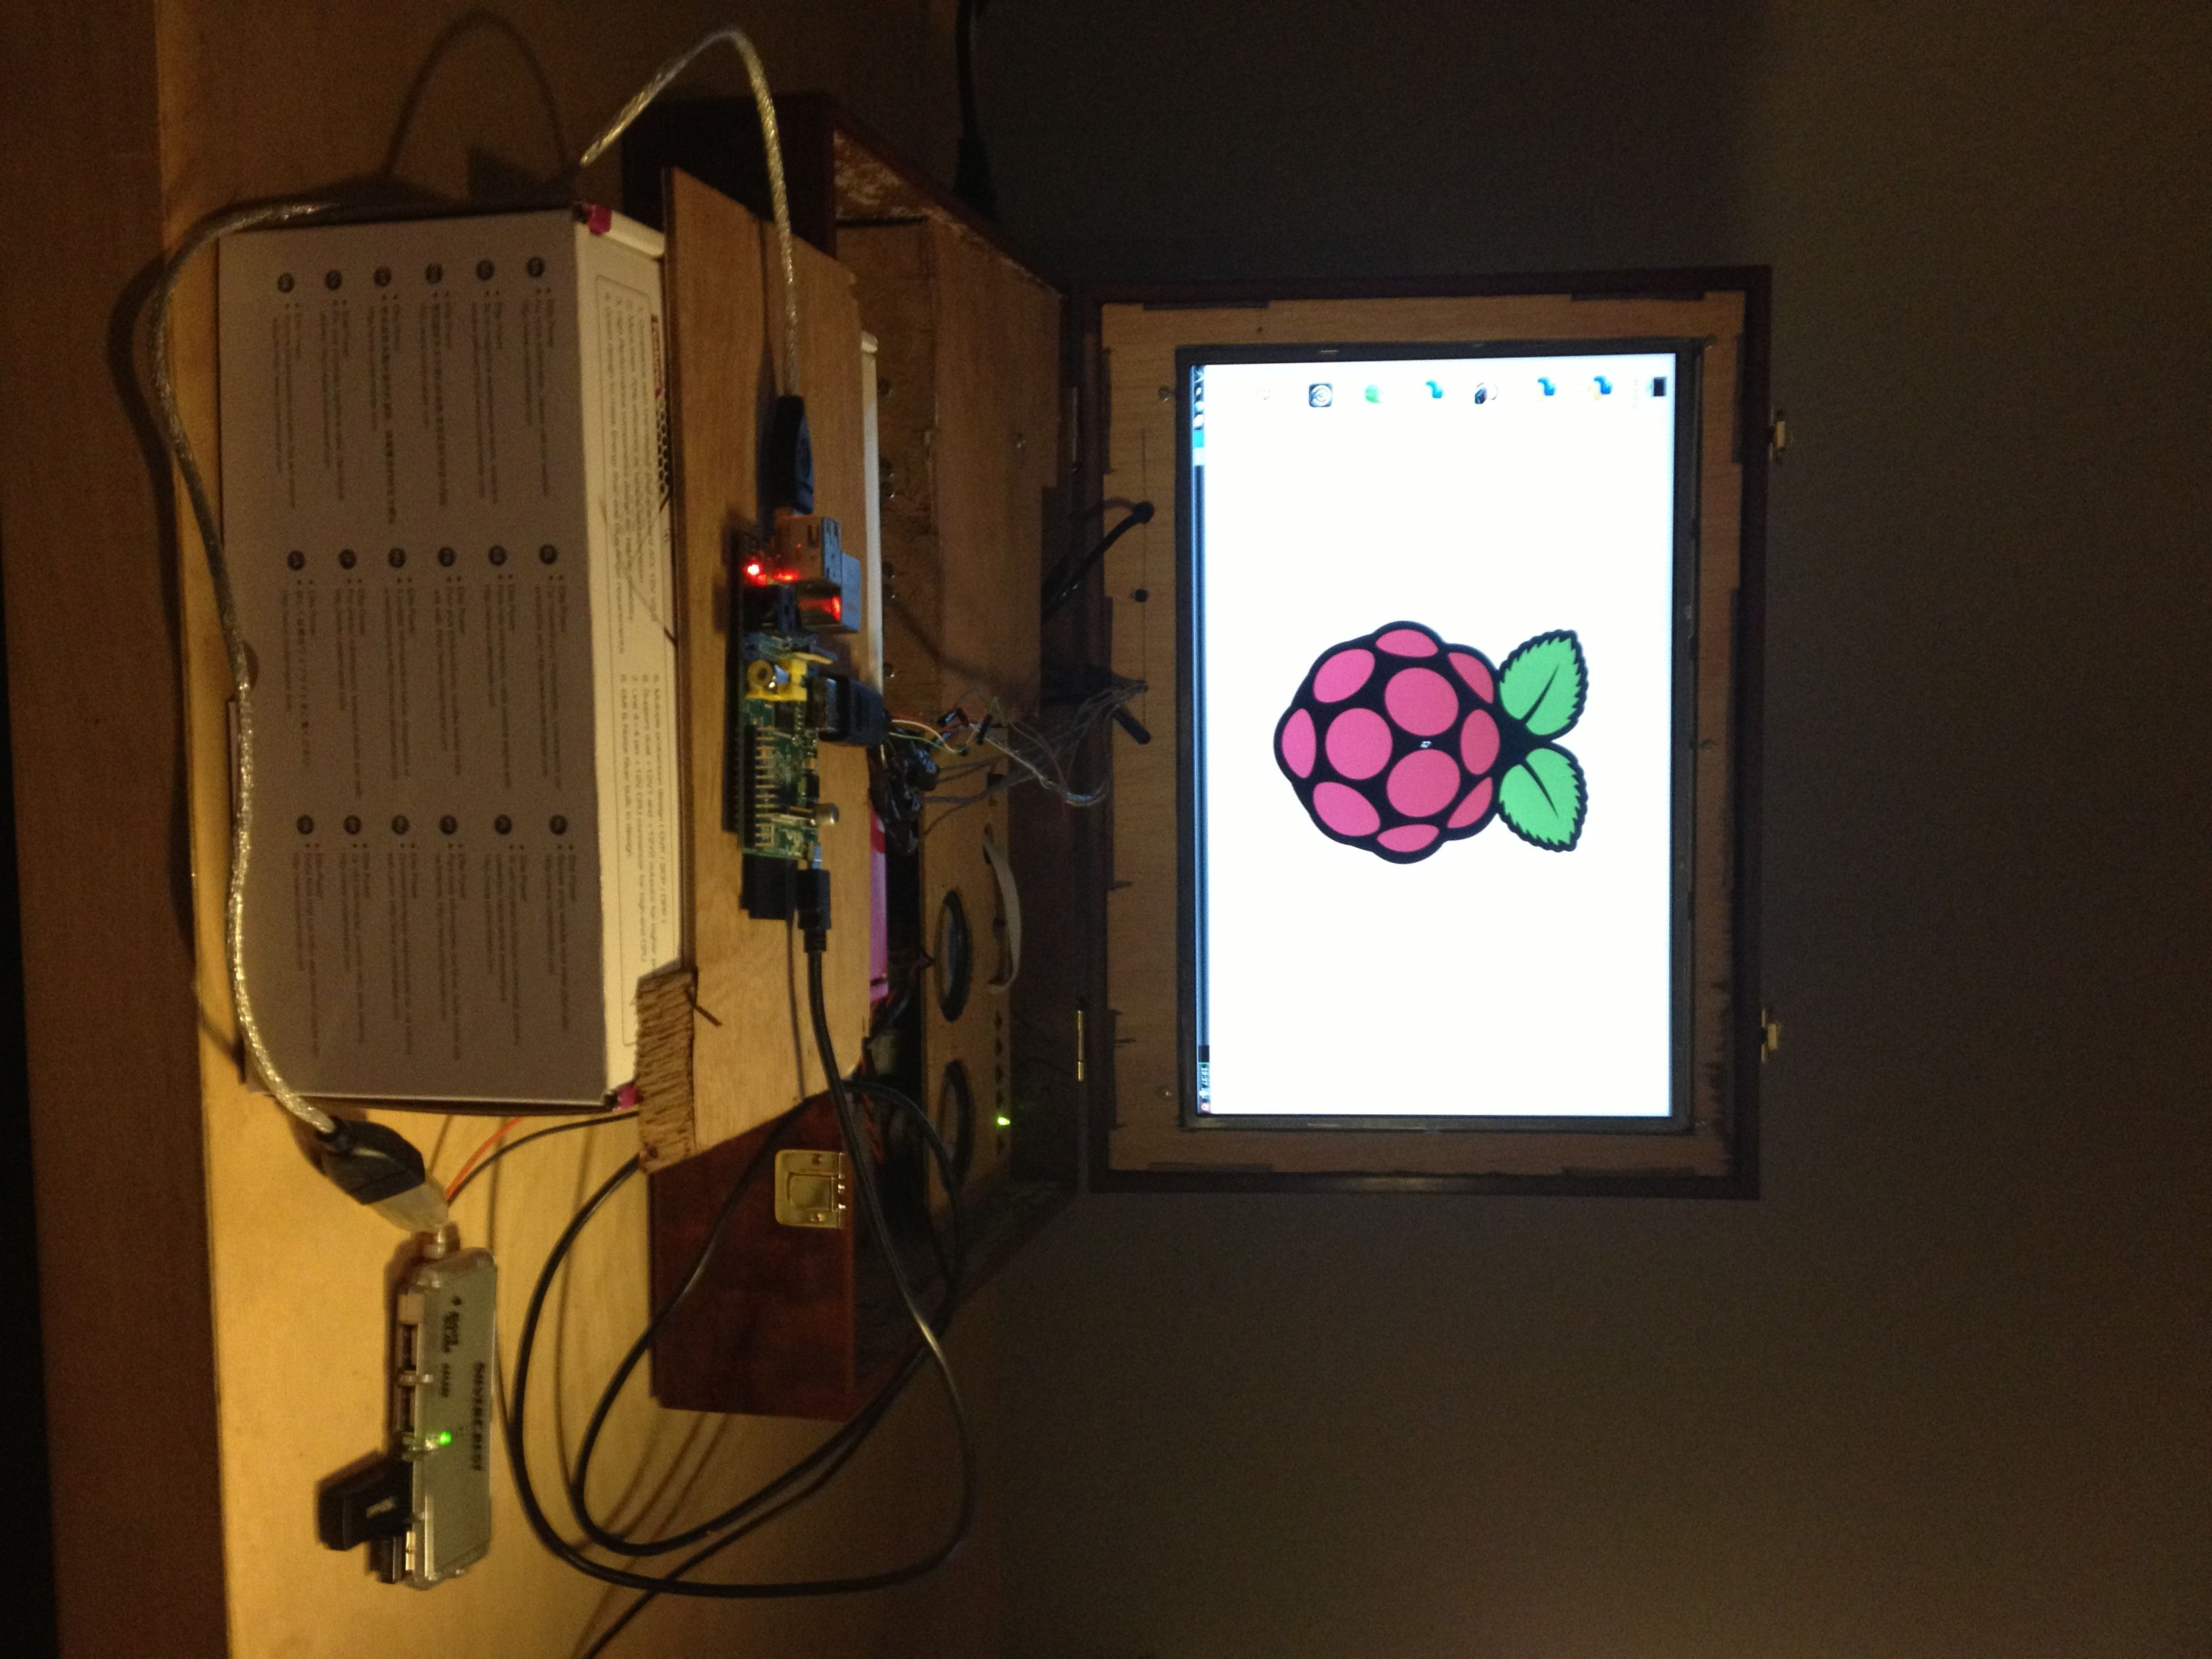 Test opstelling Raspberry pi Laptop